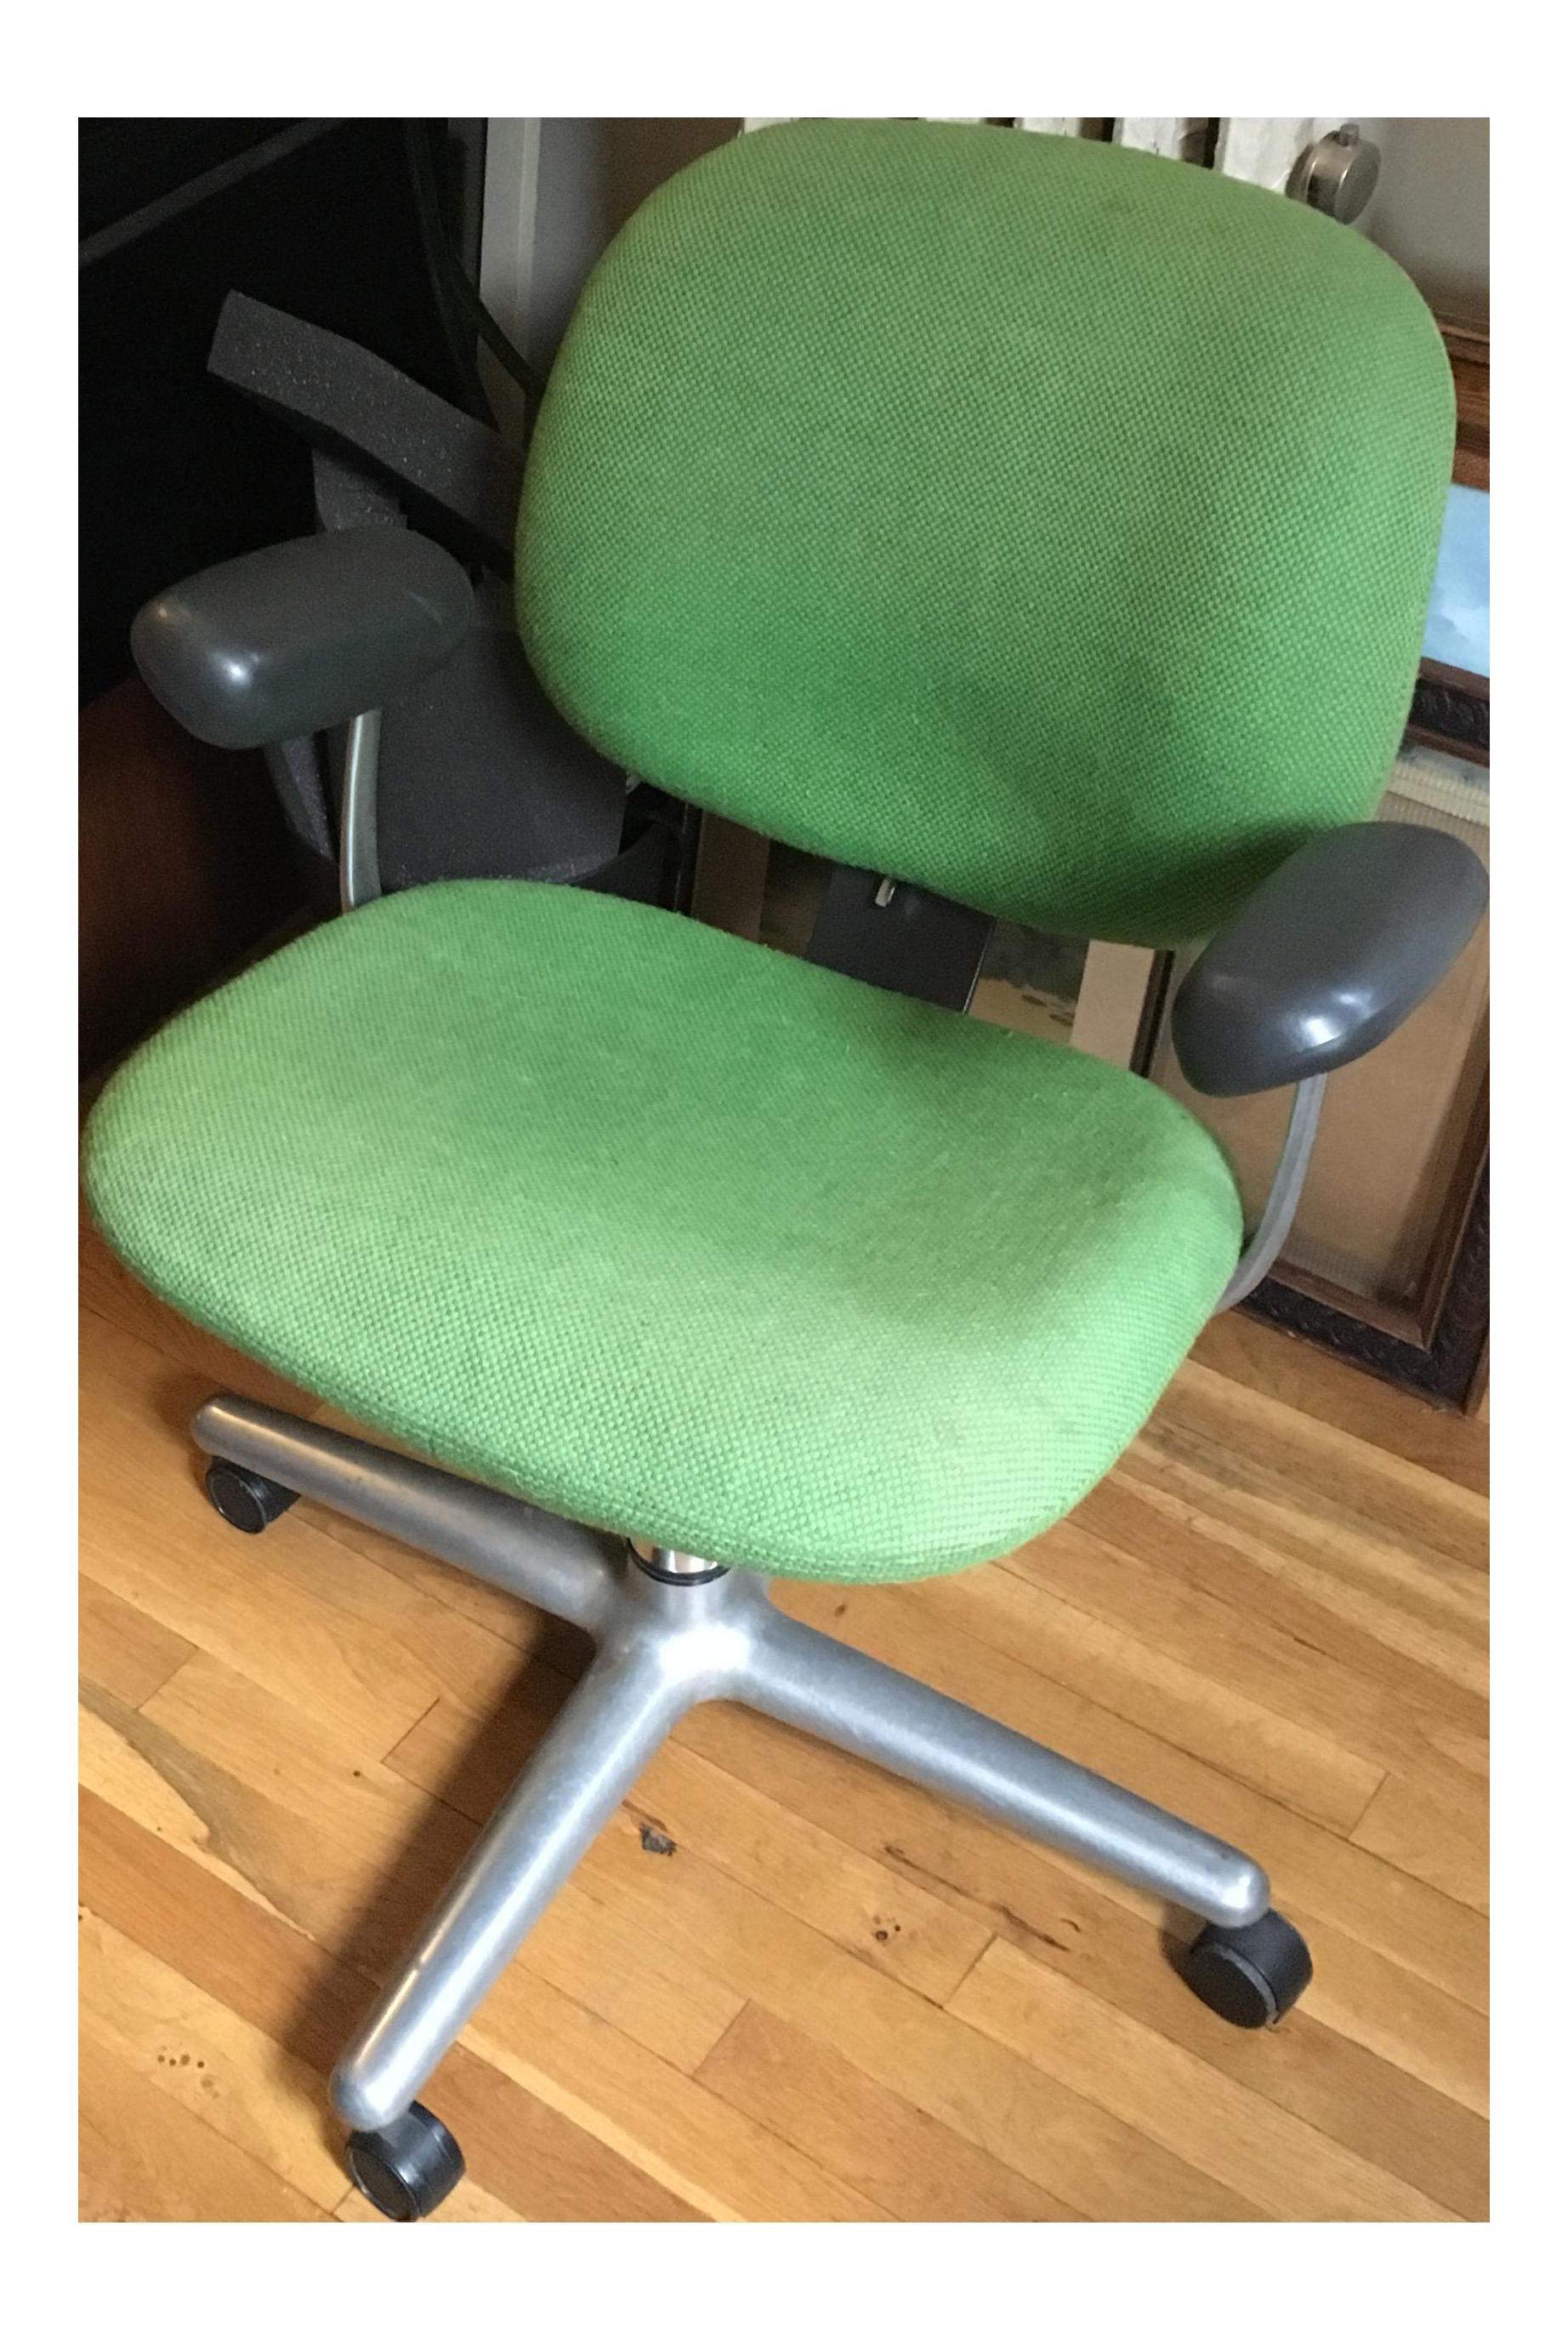 Image of: Vintage 1970s Herman Miller Ergon Office Chair Chairish